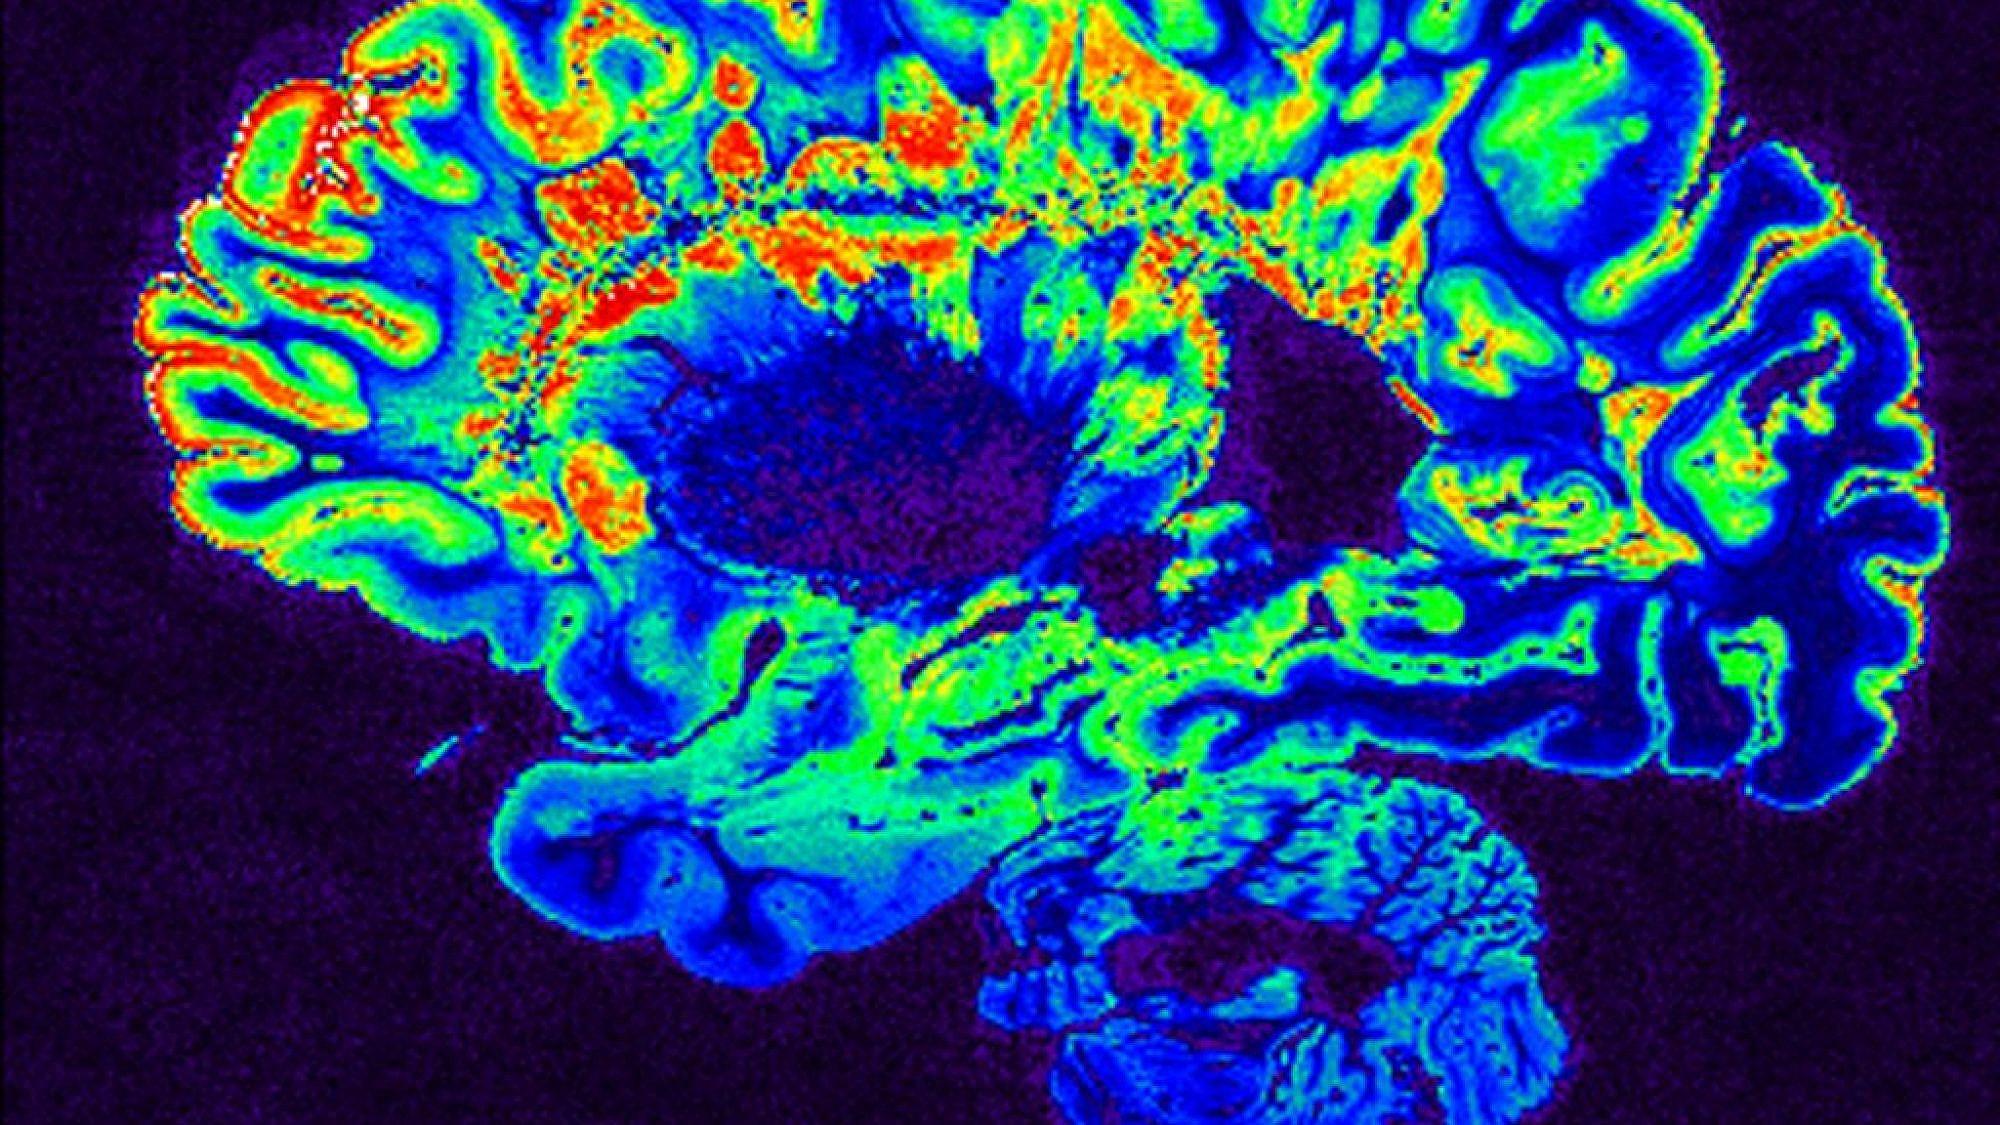 Israeli researchers create MRI technique to predict diseases, start